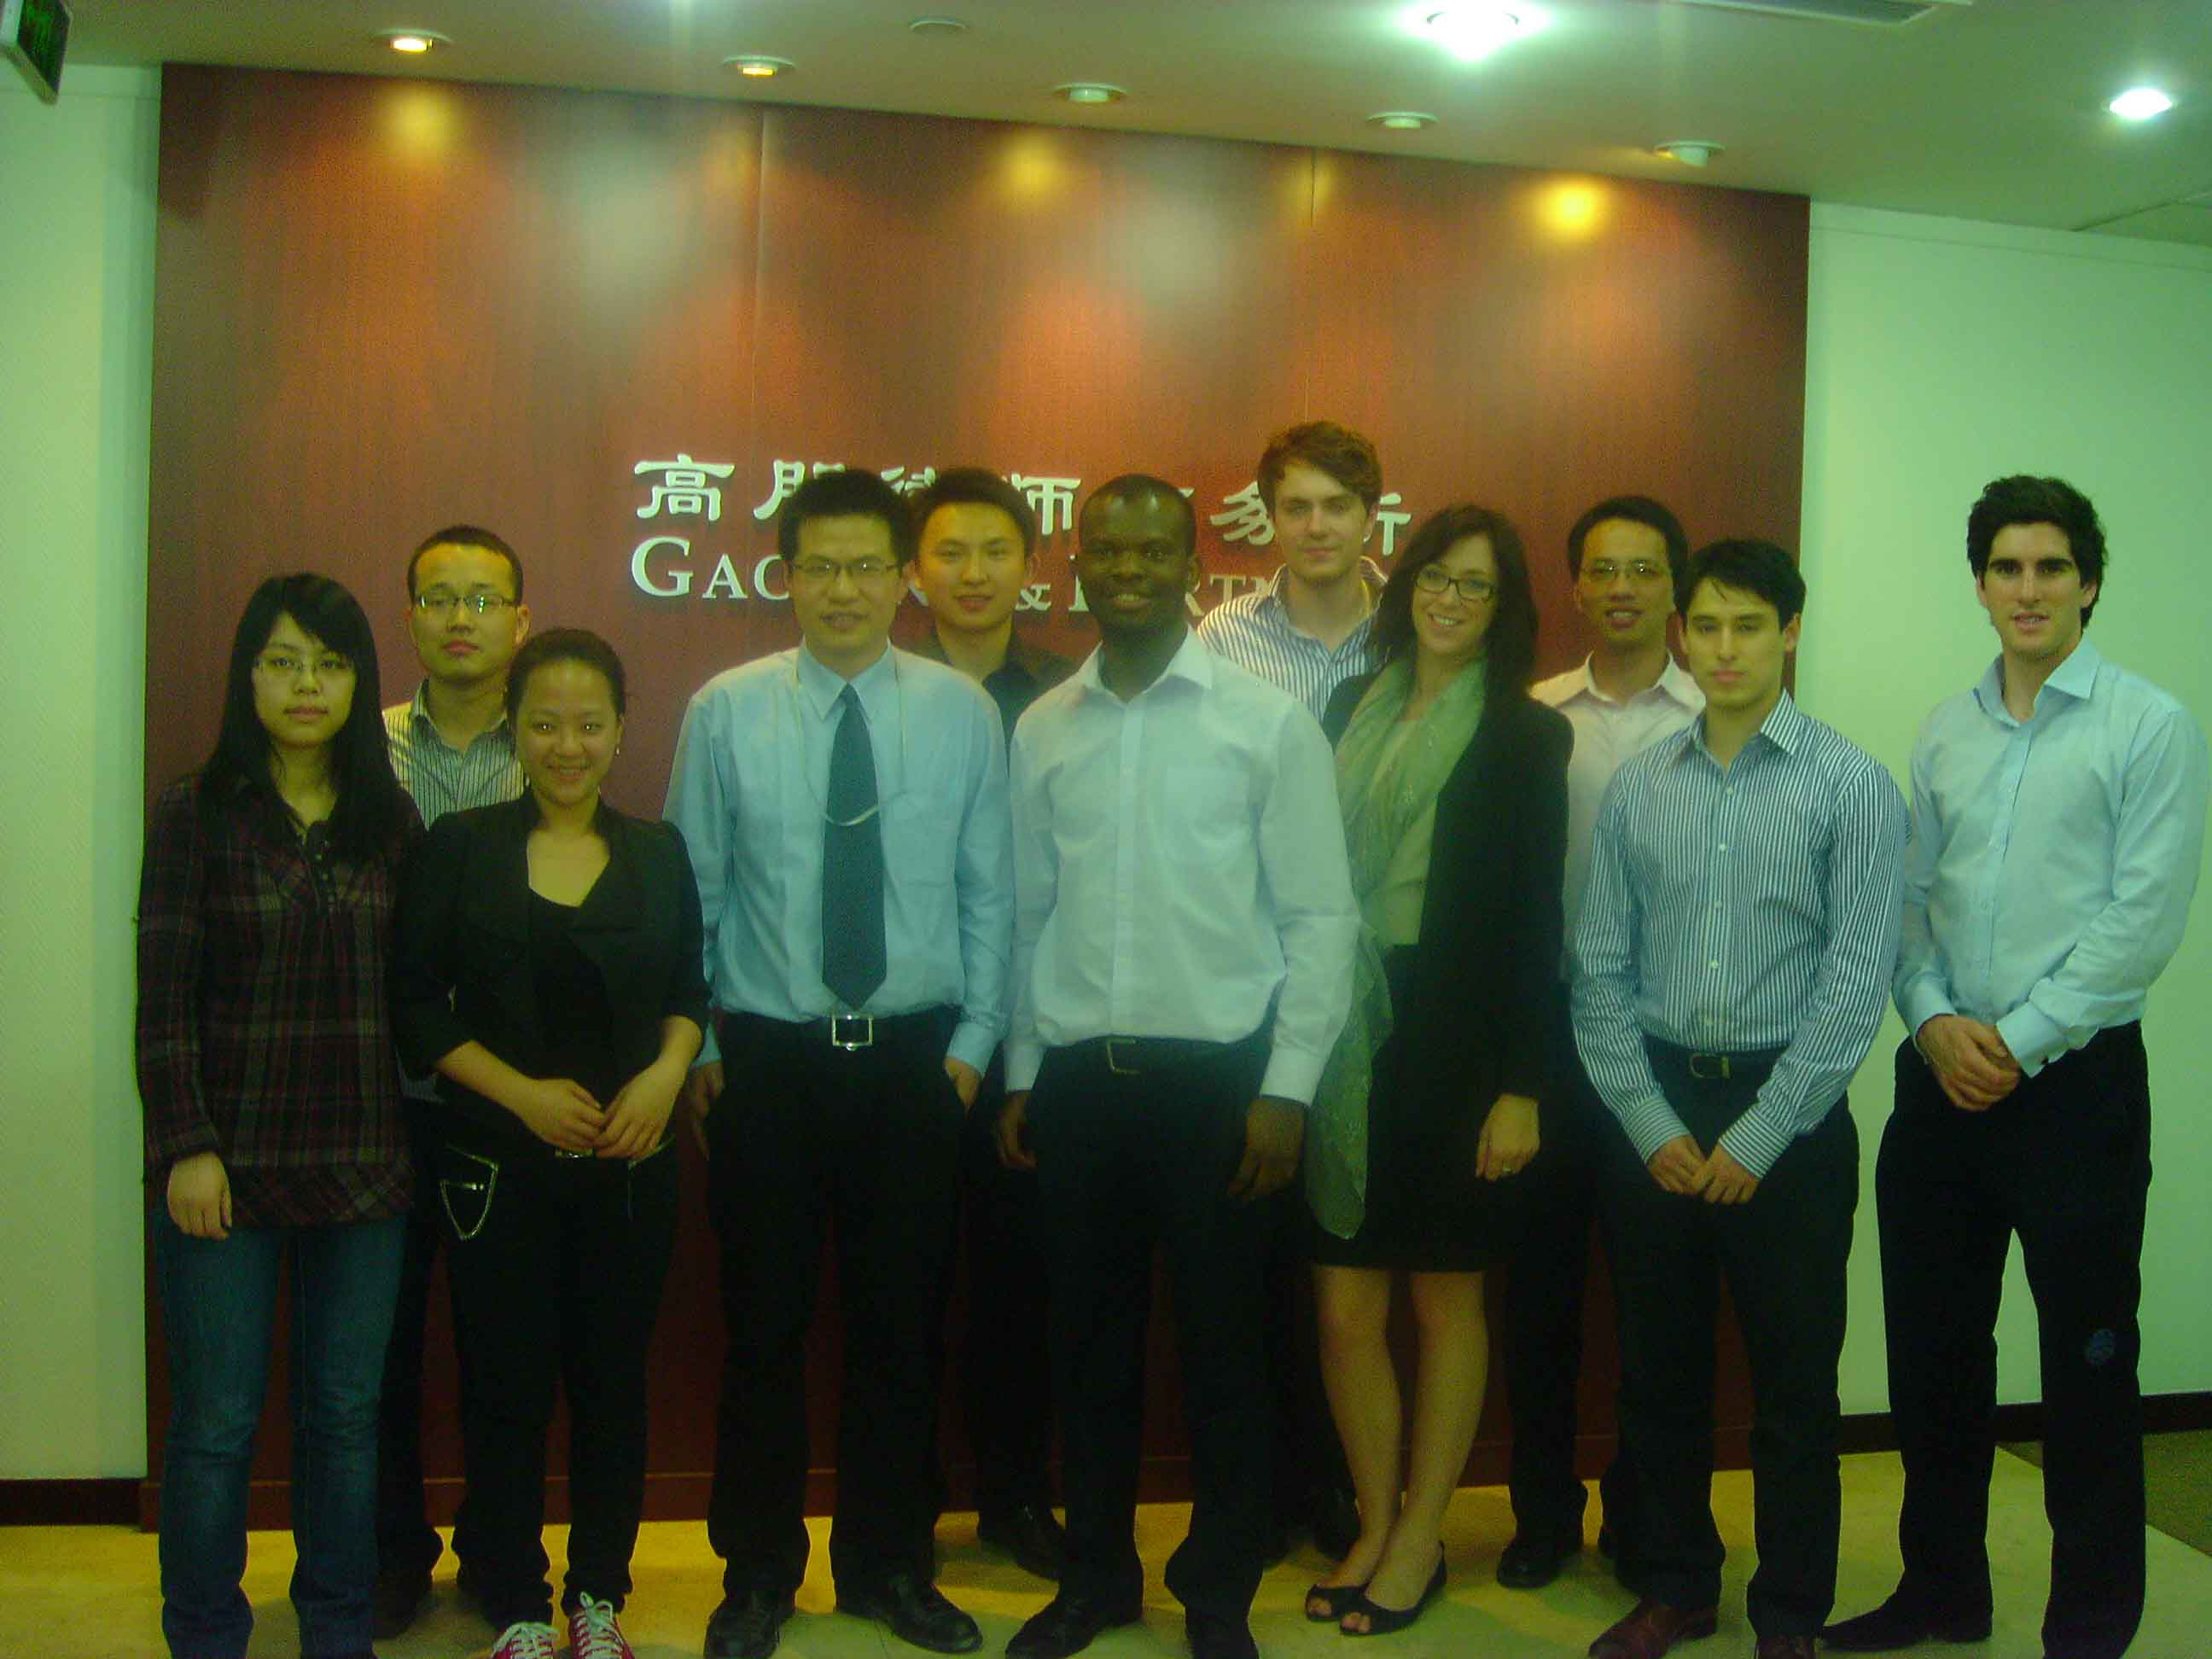 Gaopeng & Partners-1